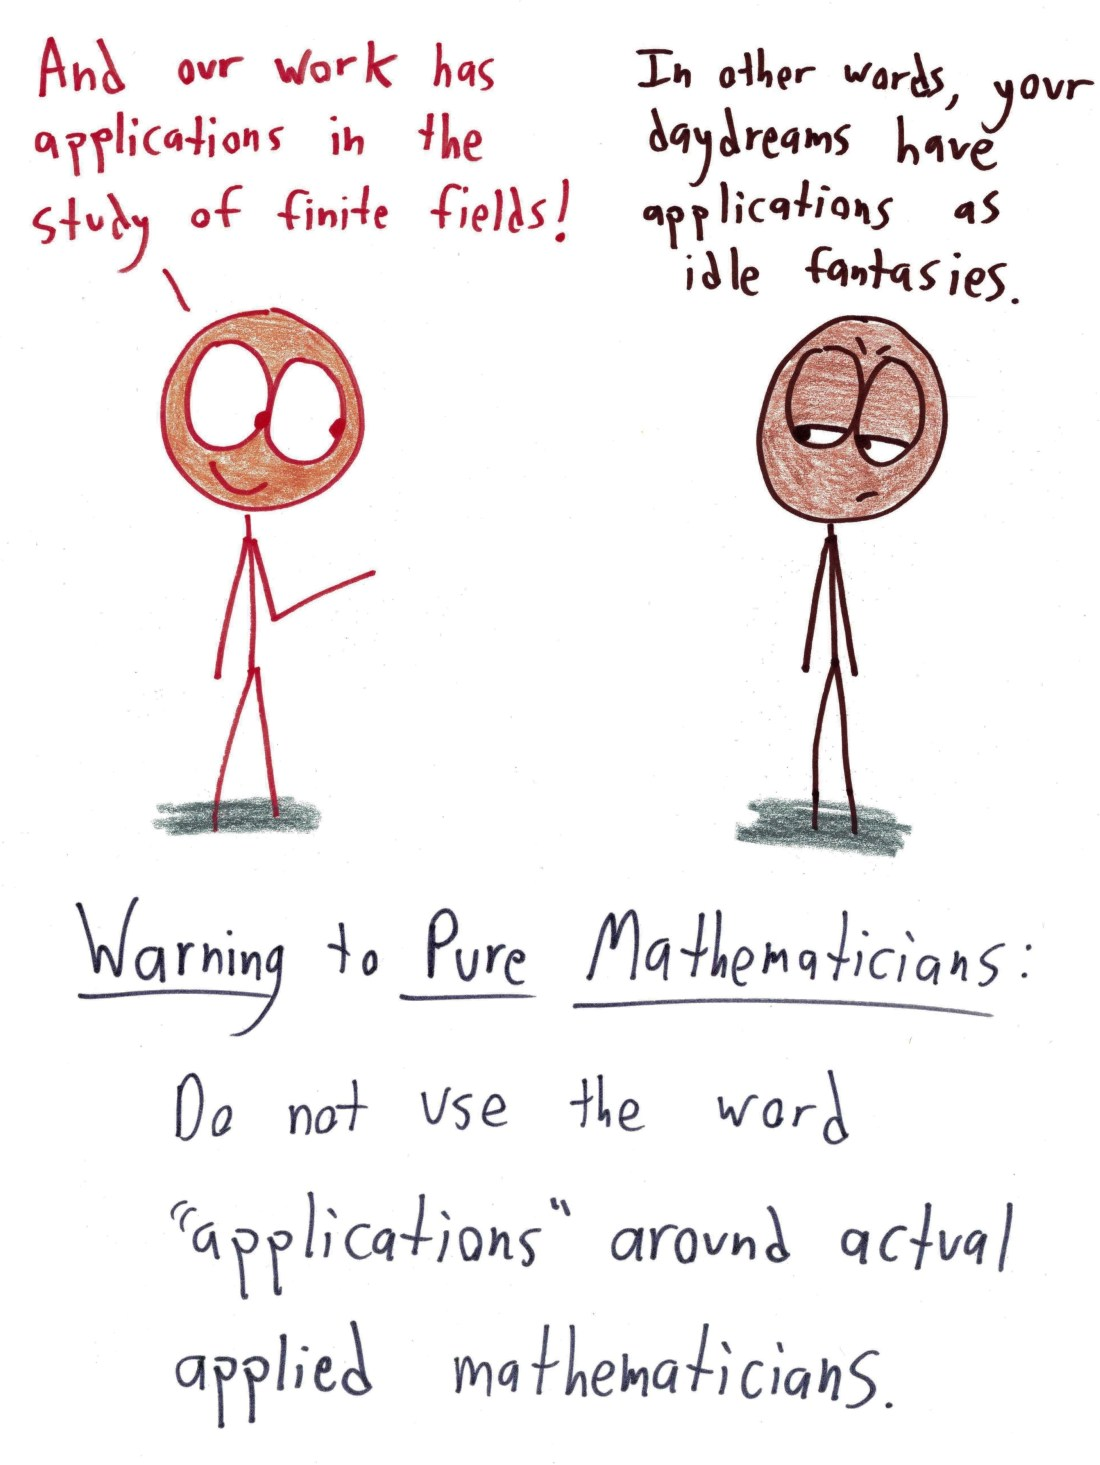 2017.8.31 applications